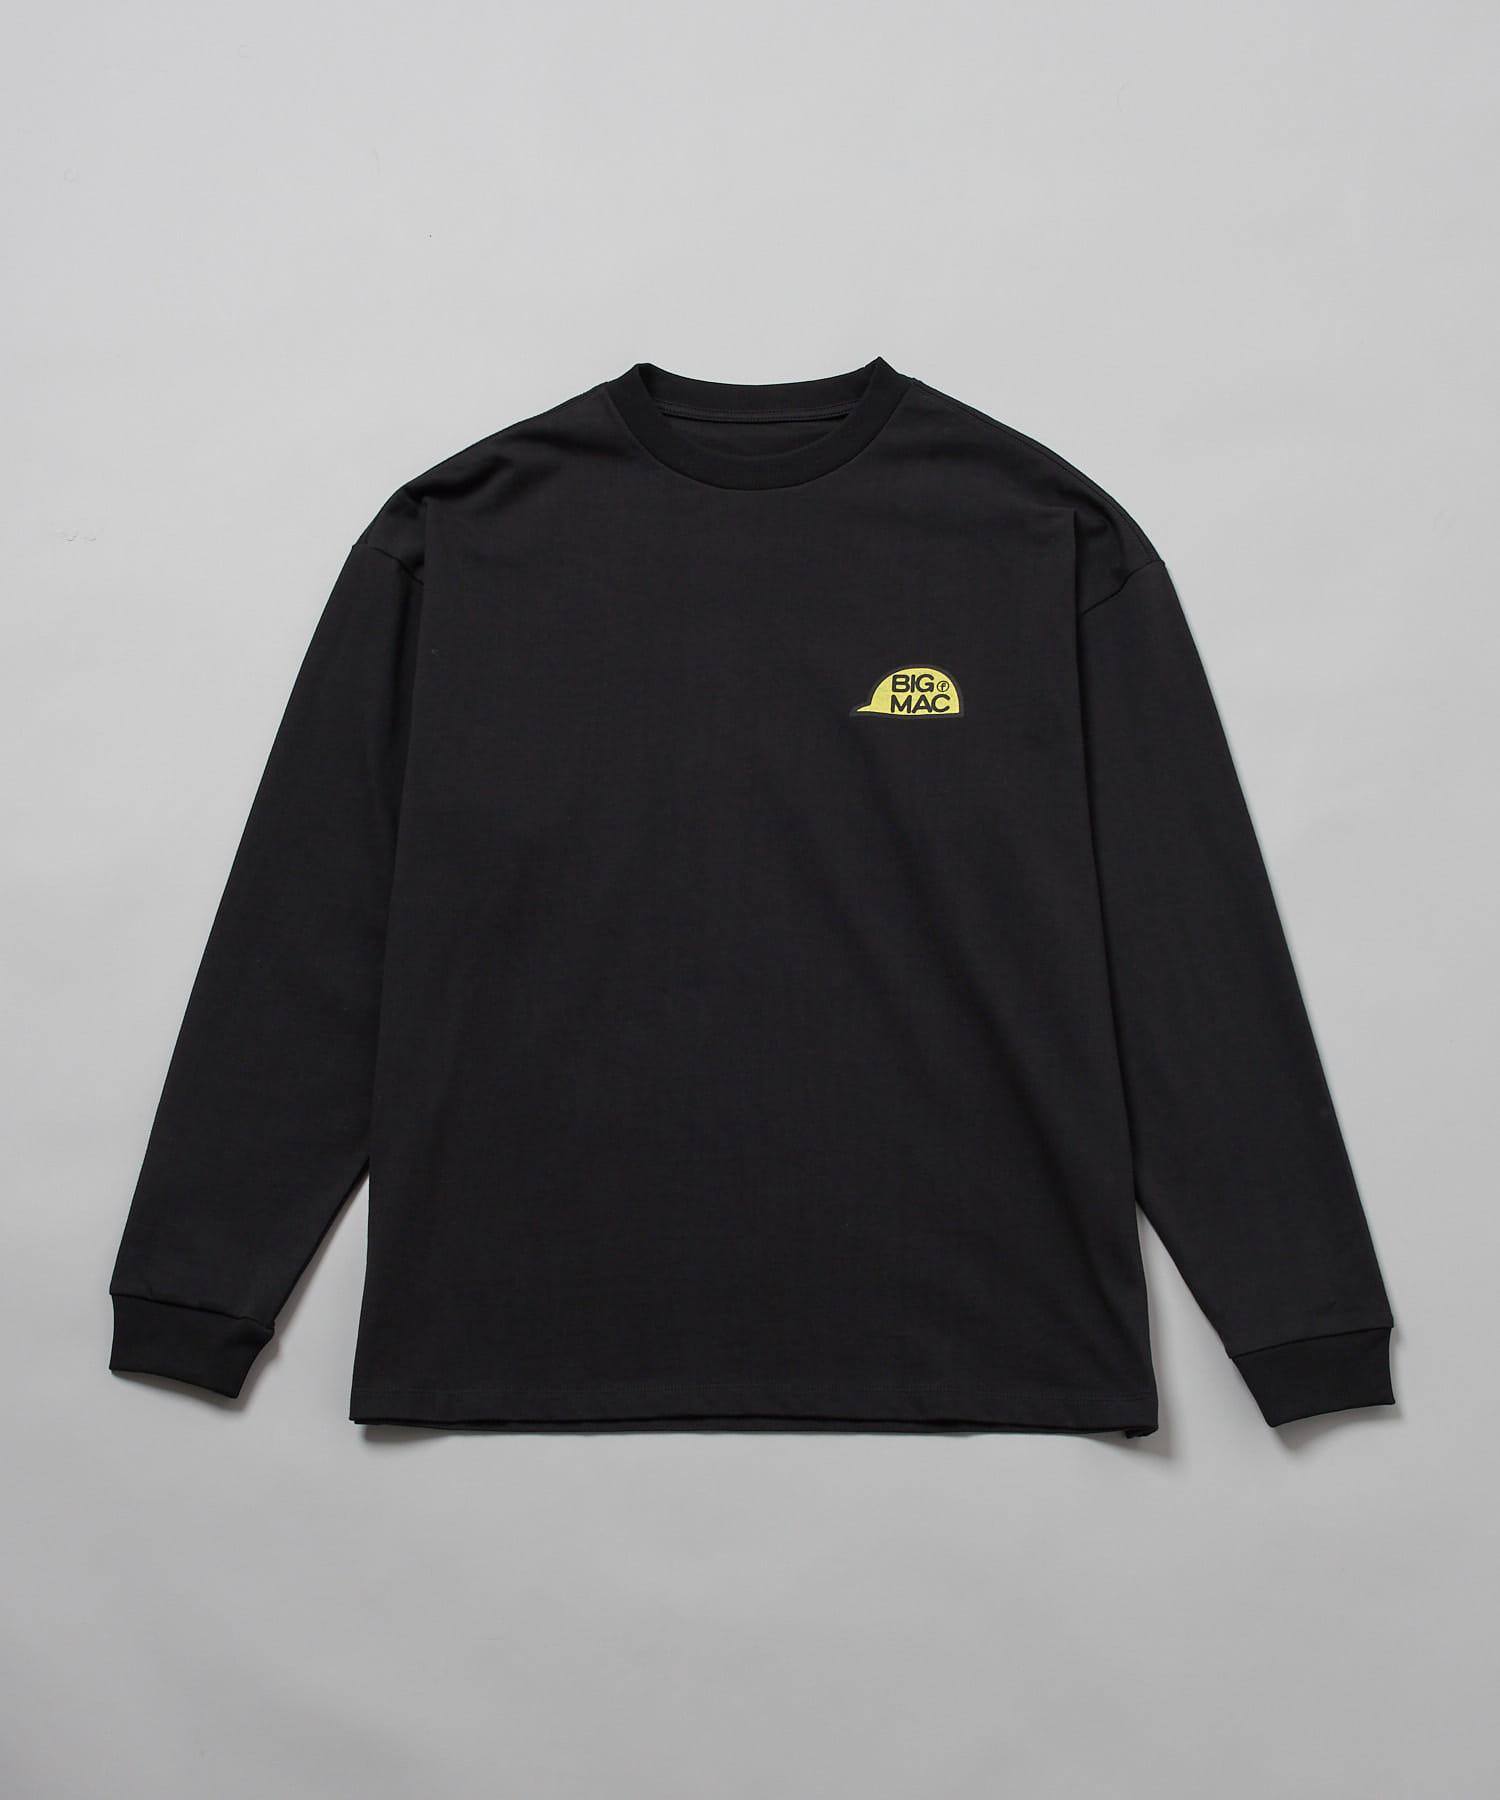 OUTLET(アウトレット) メンズ 【Ciaopanic】【BIG MAC×FACE】CAPプリントTシャツ/ロンT ブラック